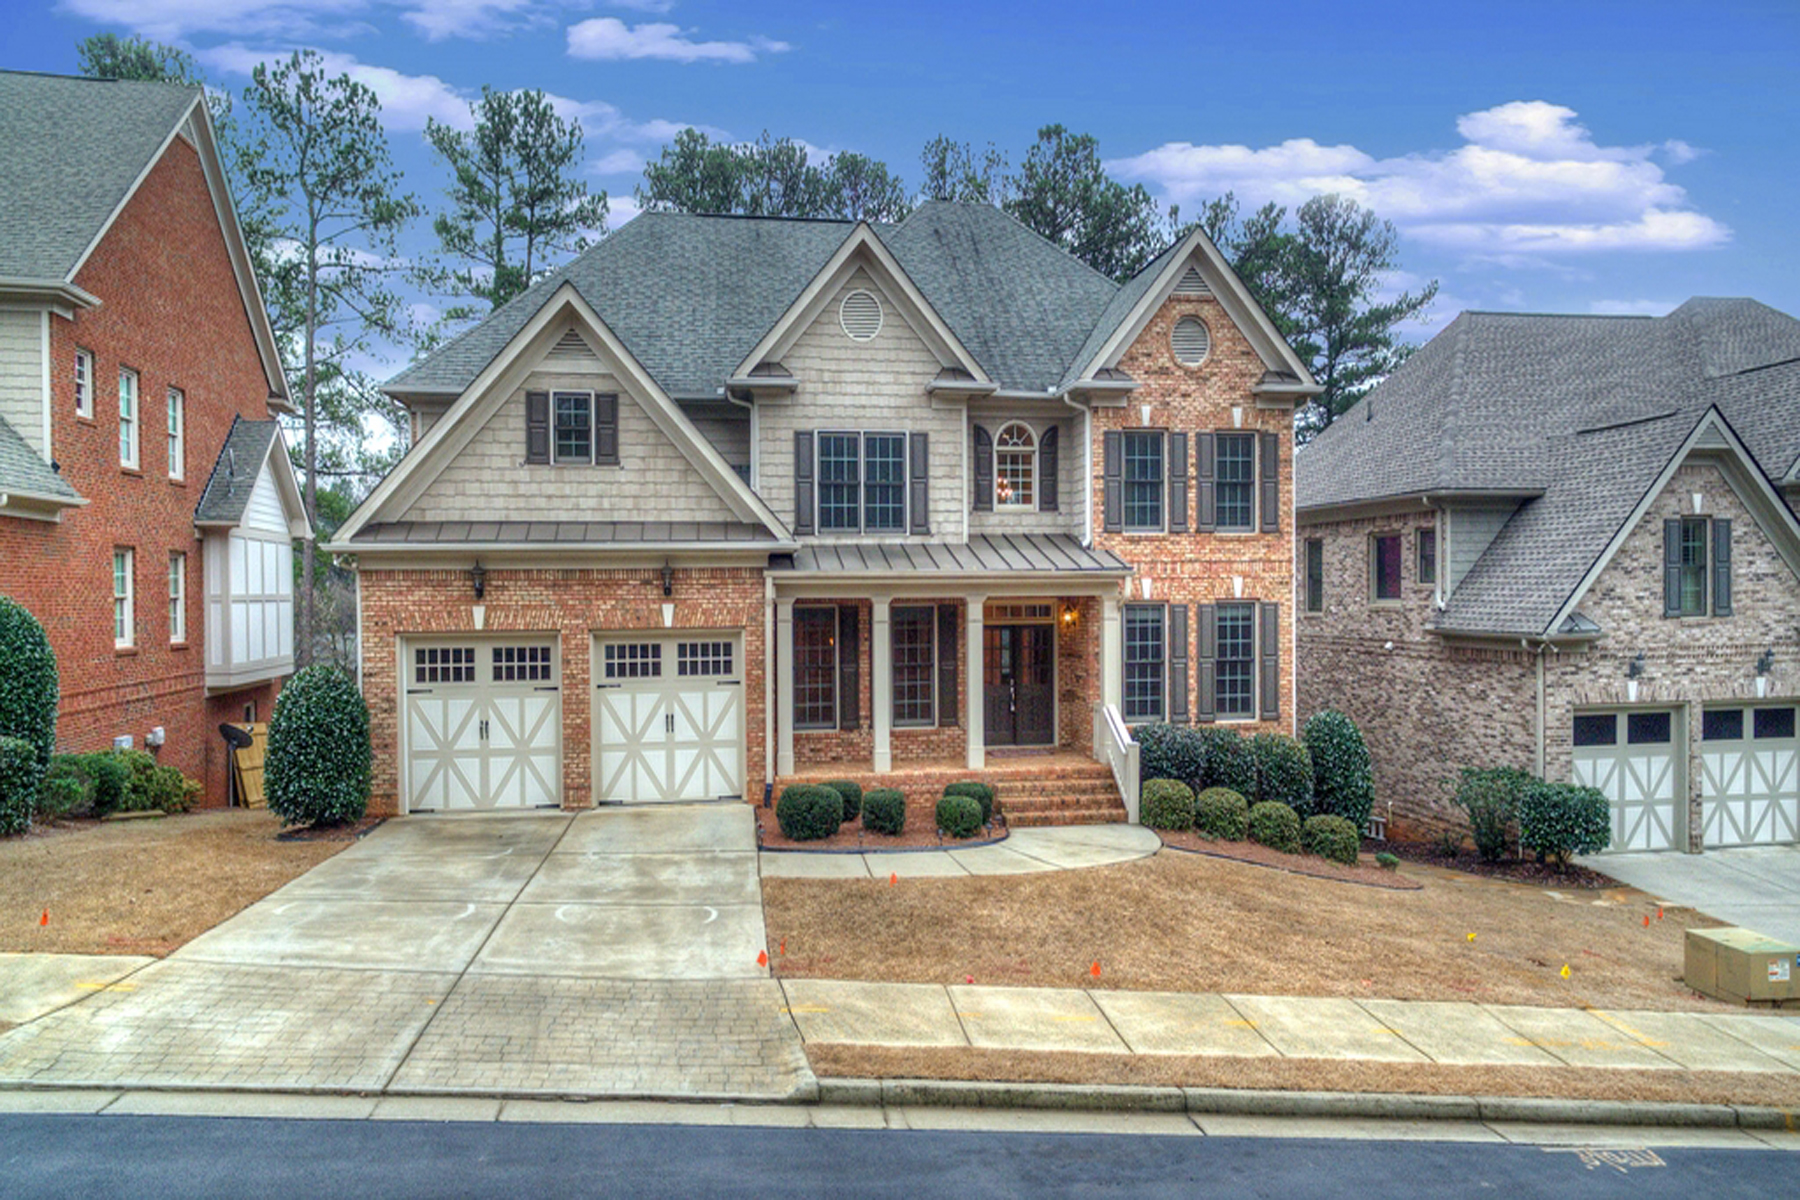 Nhà ở một gia đình vì Bán tại Alpharetta Awesome 155 Arden Place Alpharetta, Georgia, 30022 Hoa Kỳ